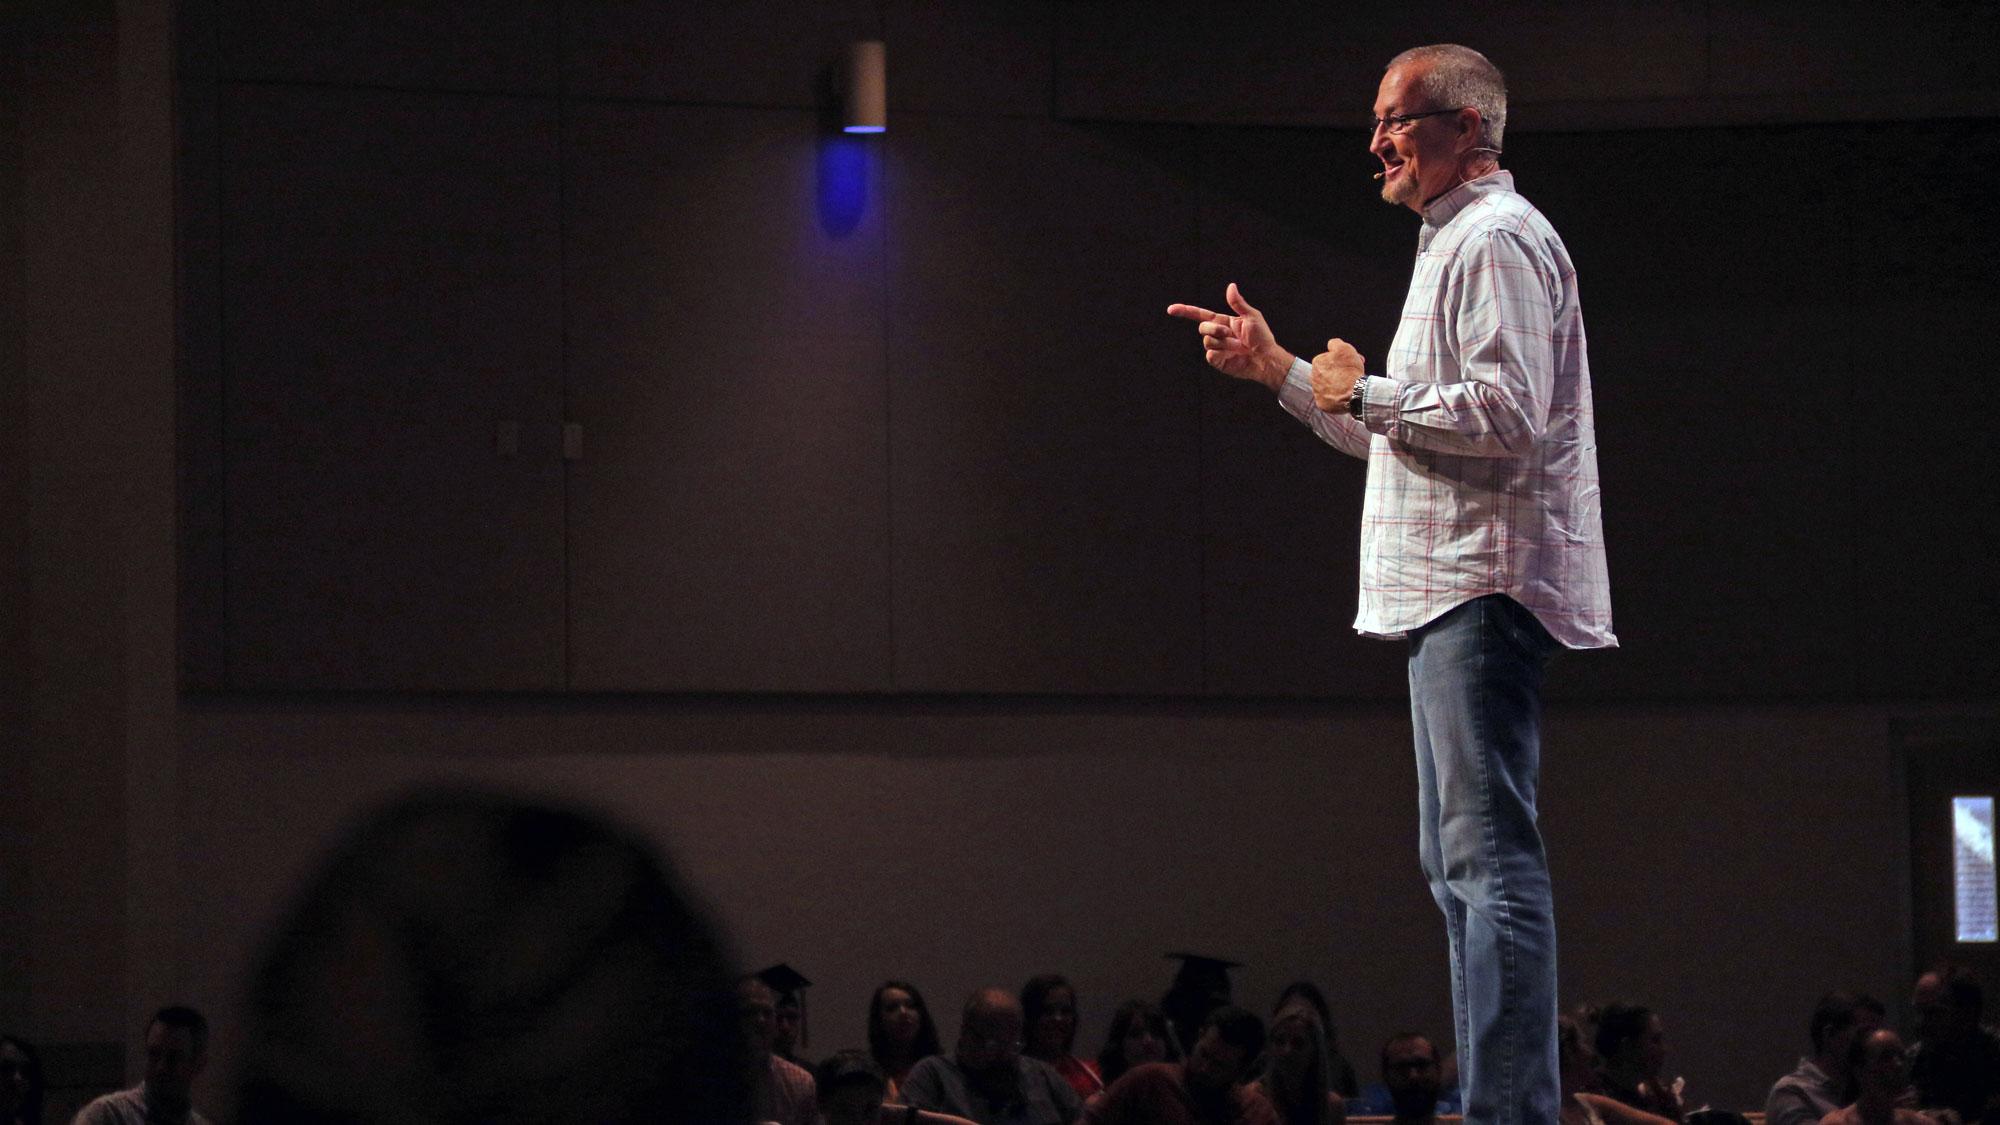 Pastor Gary Preaching